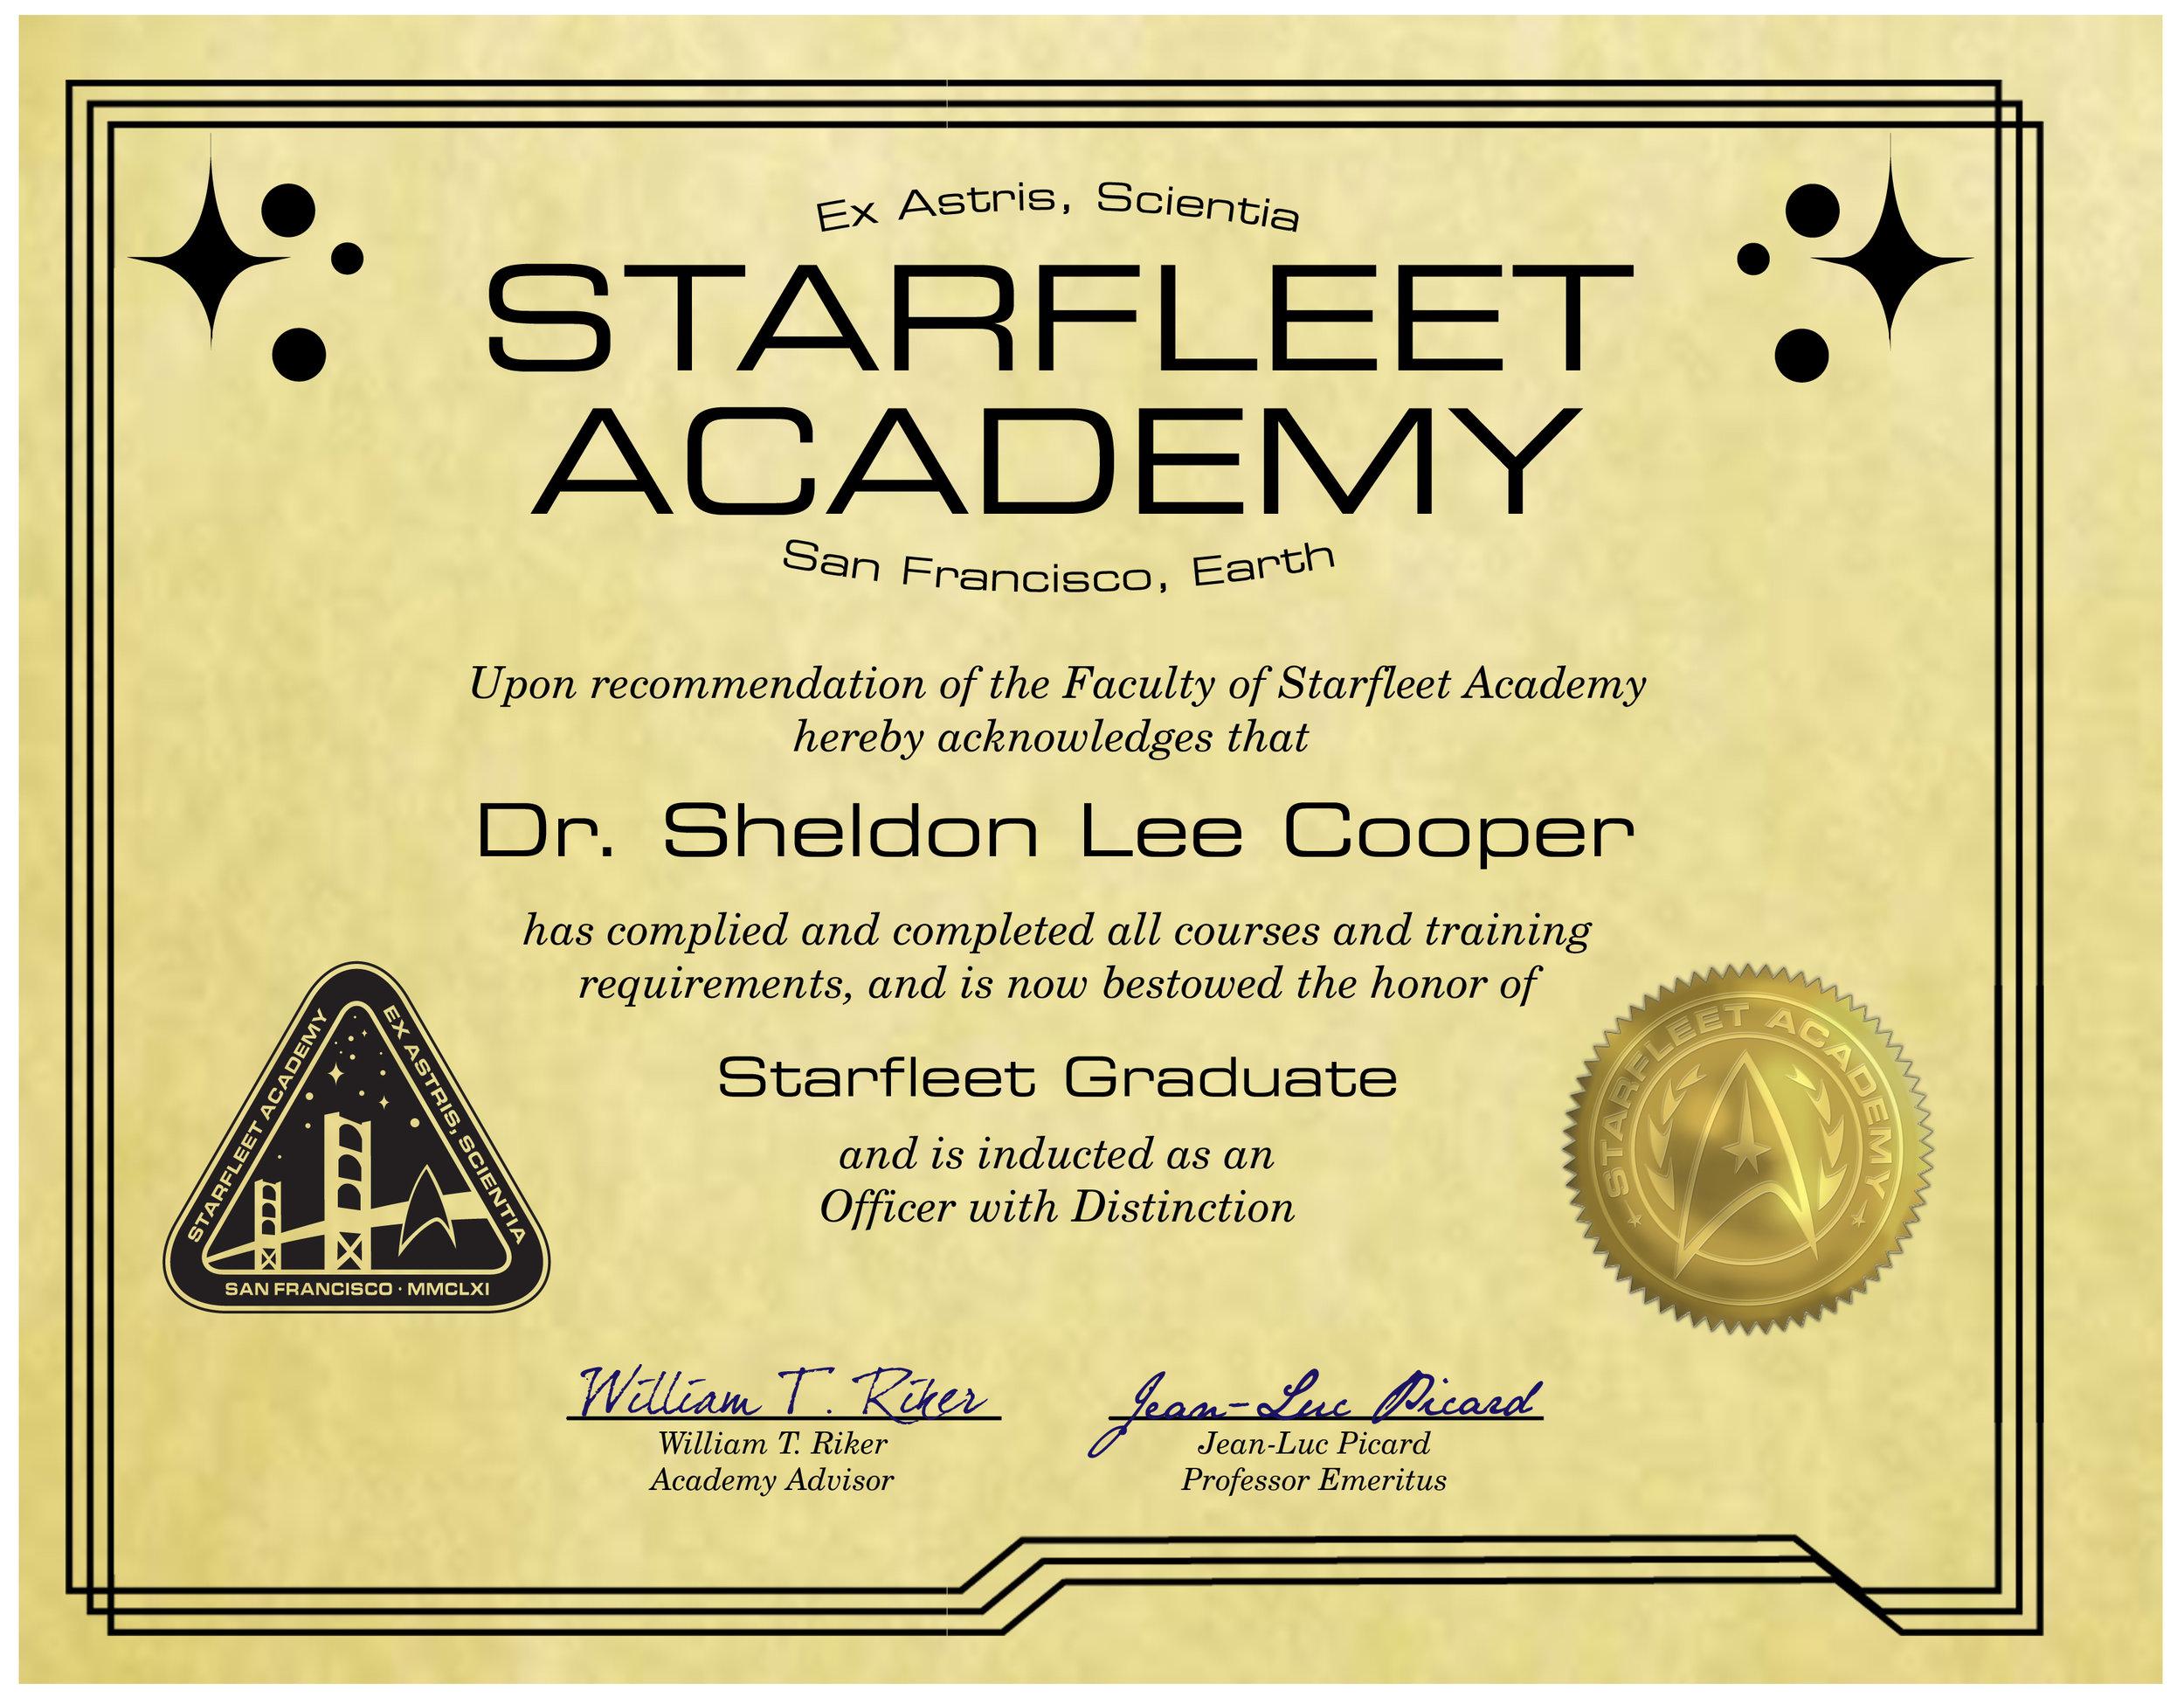 starfleet-academy-diploma-01.jpg